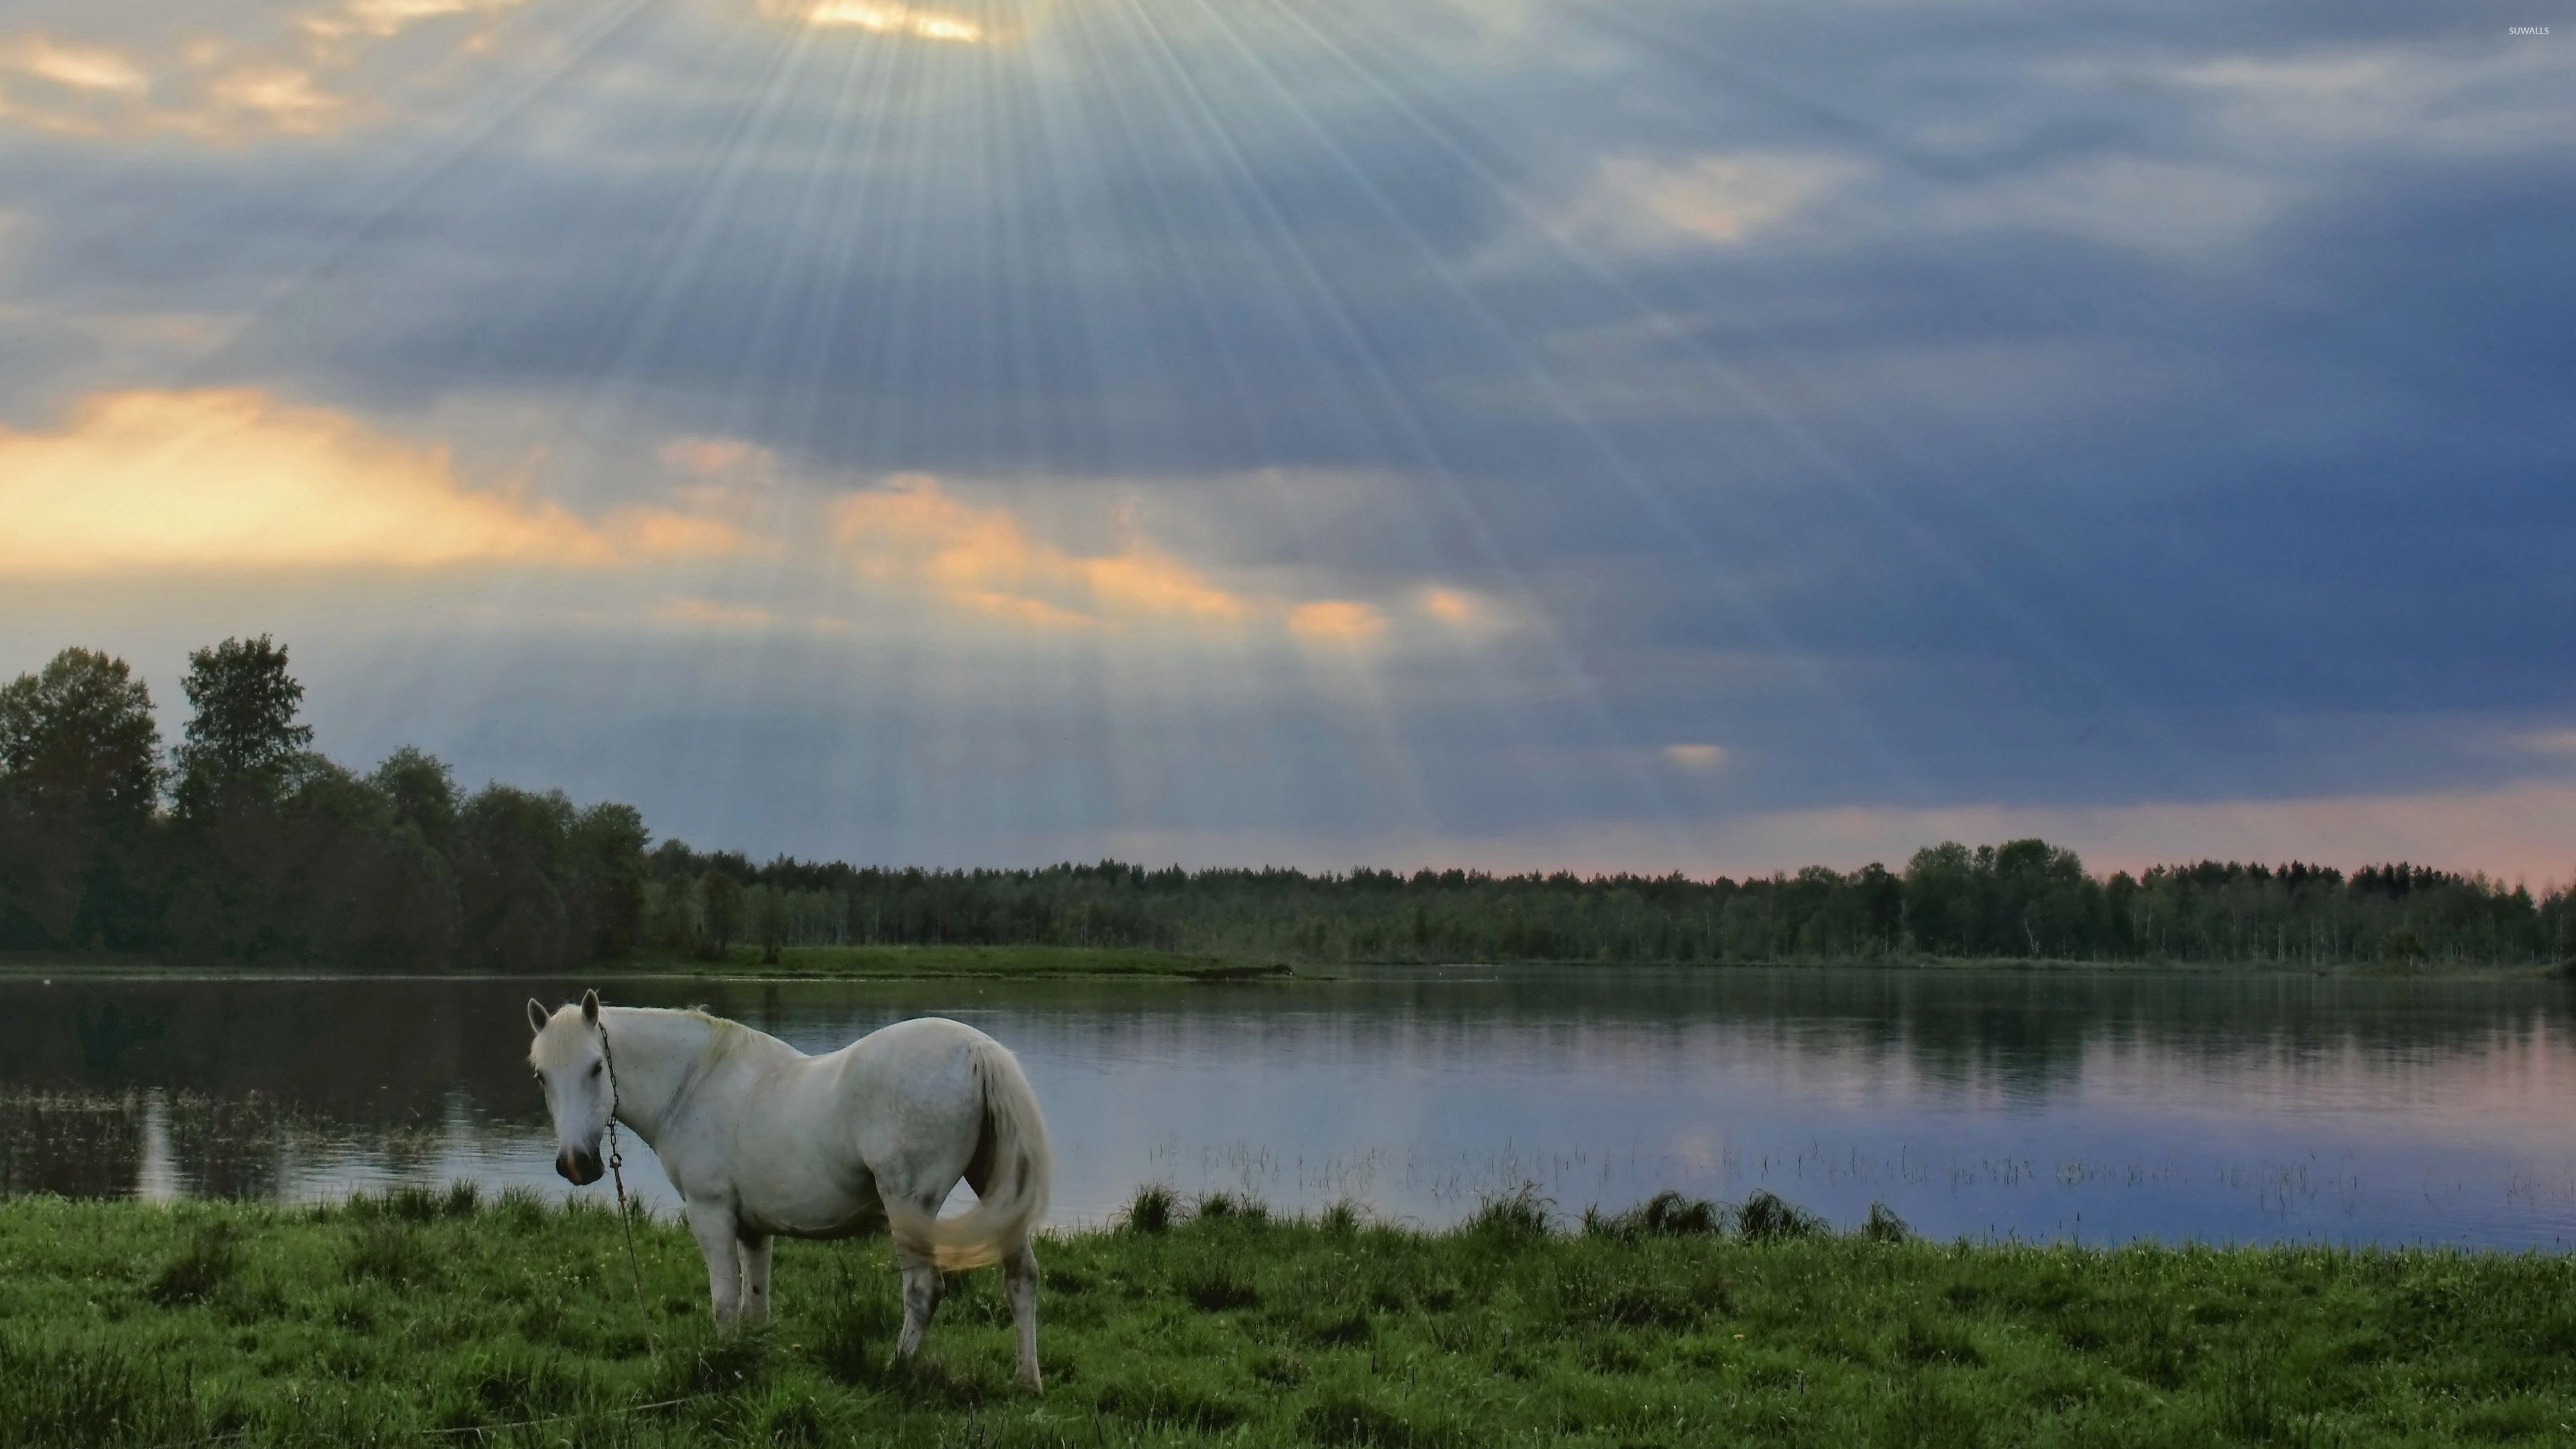 White Horse Wallpaper Animal Wallpapers 39016